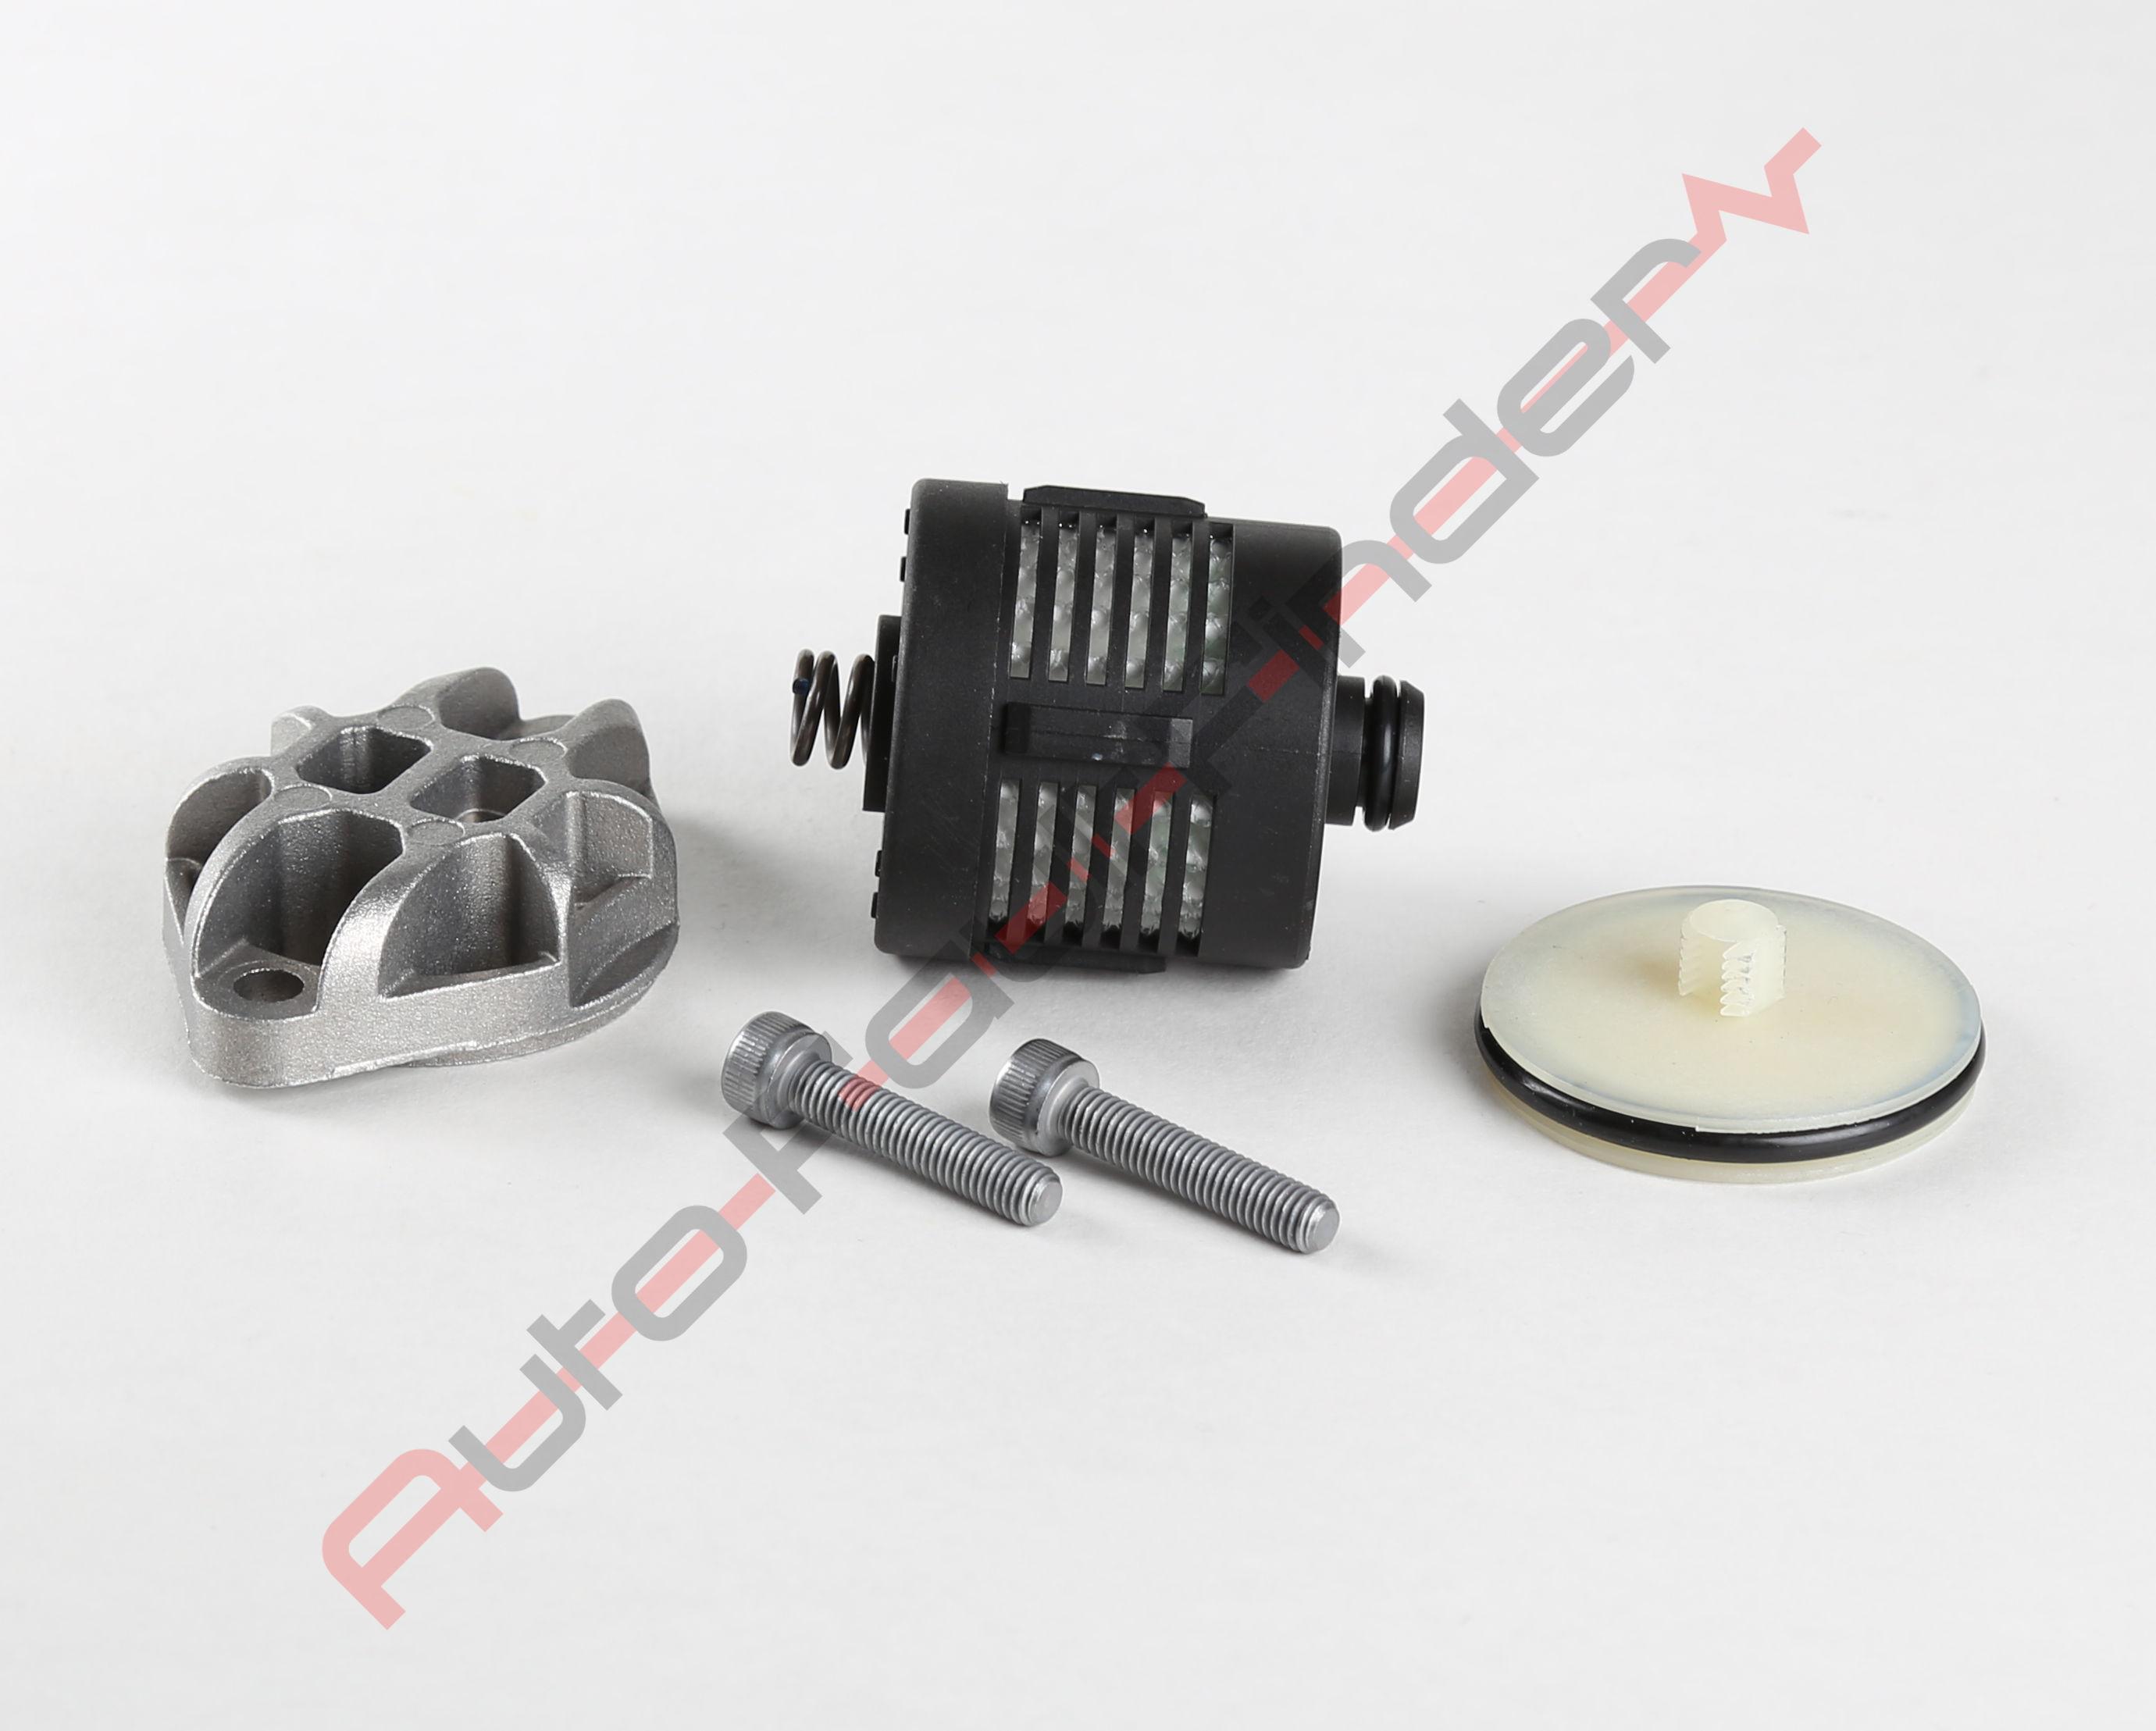 Volvo AWD Haldex Oil filter 30787687 - Haldex Parts and ...